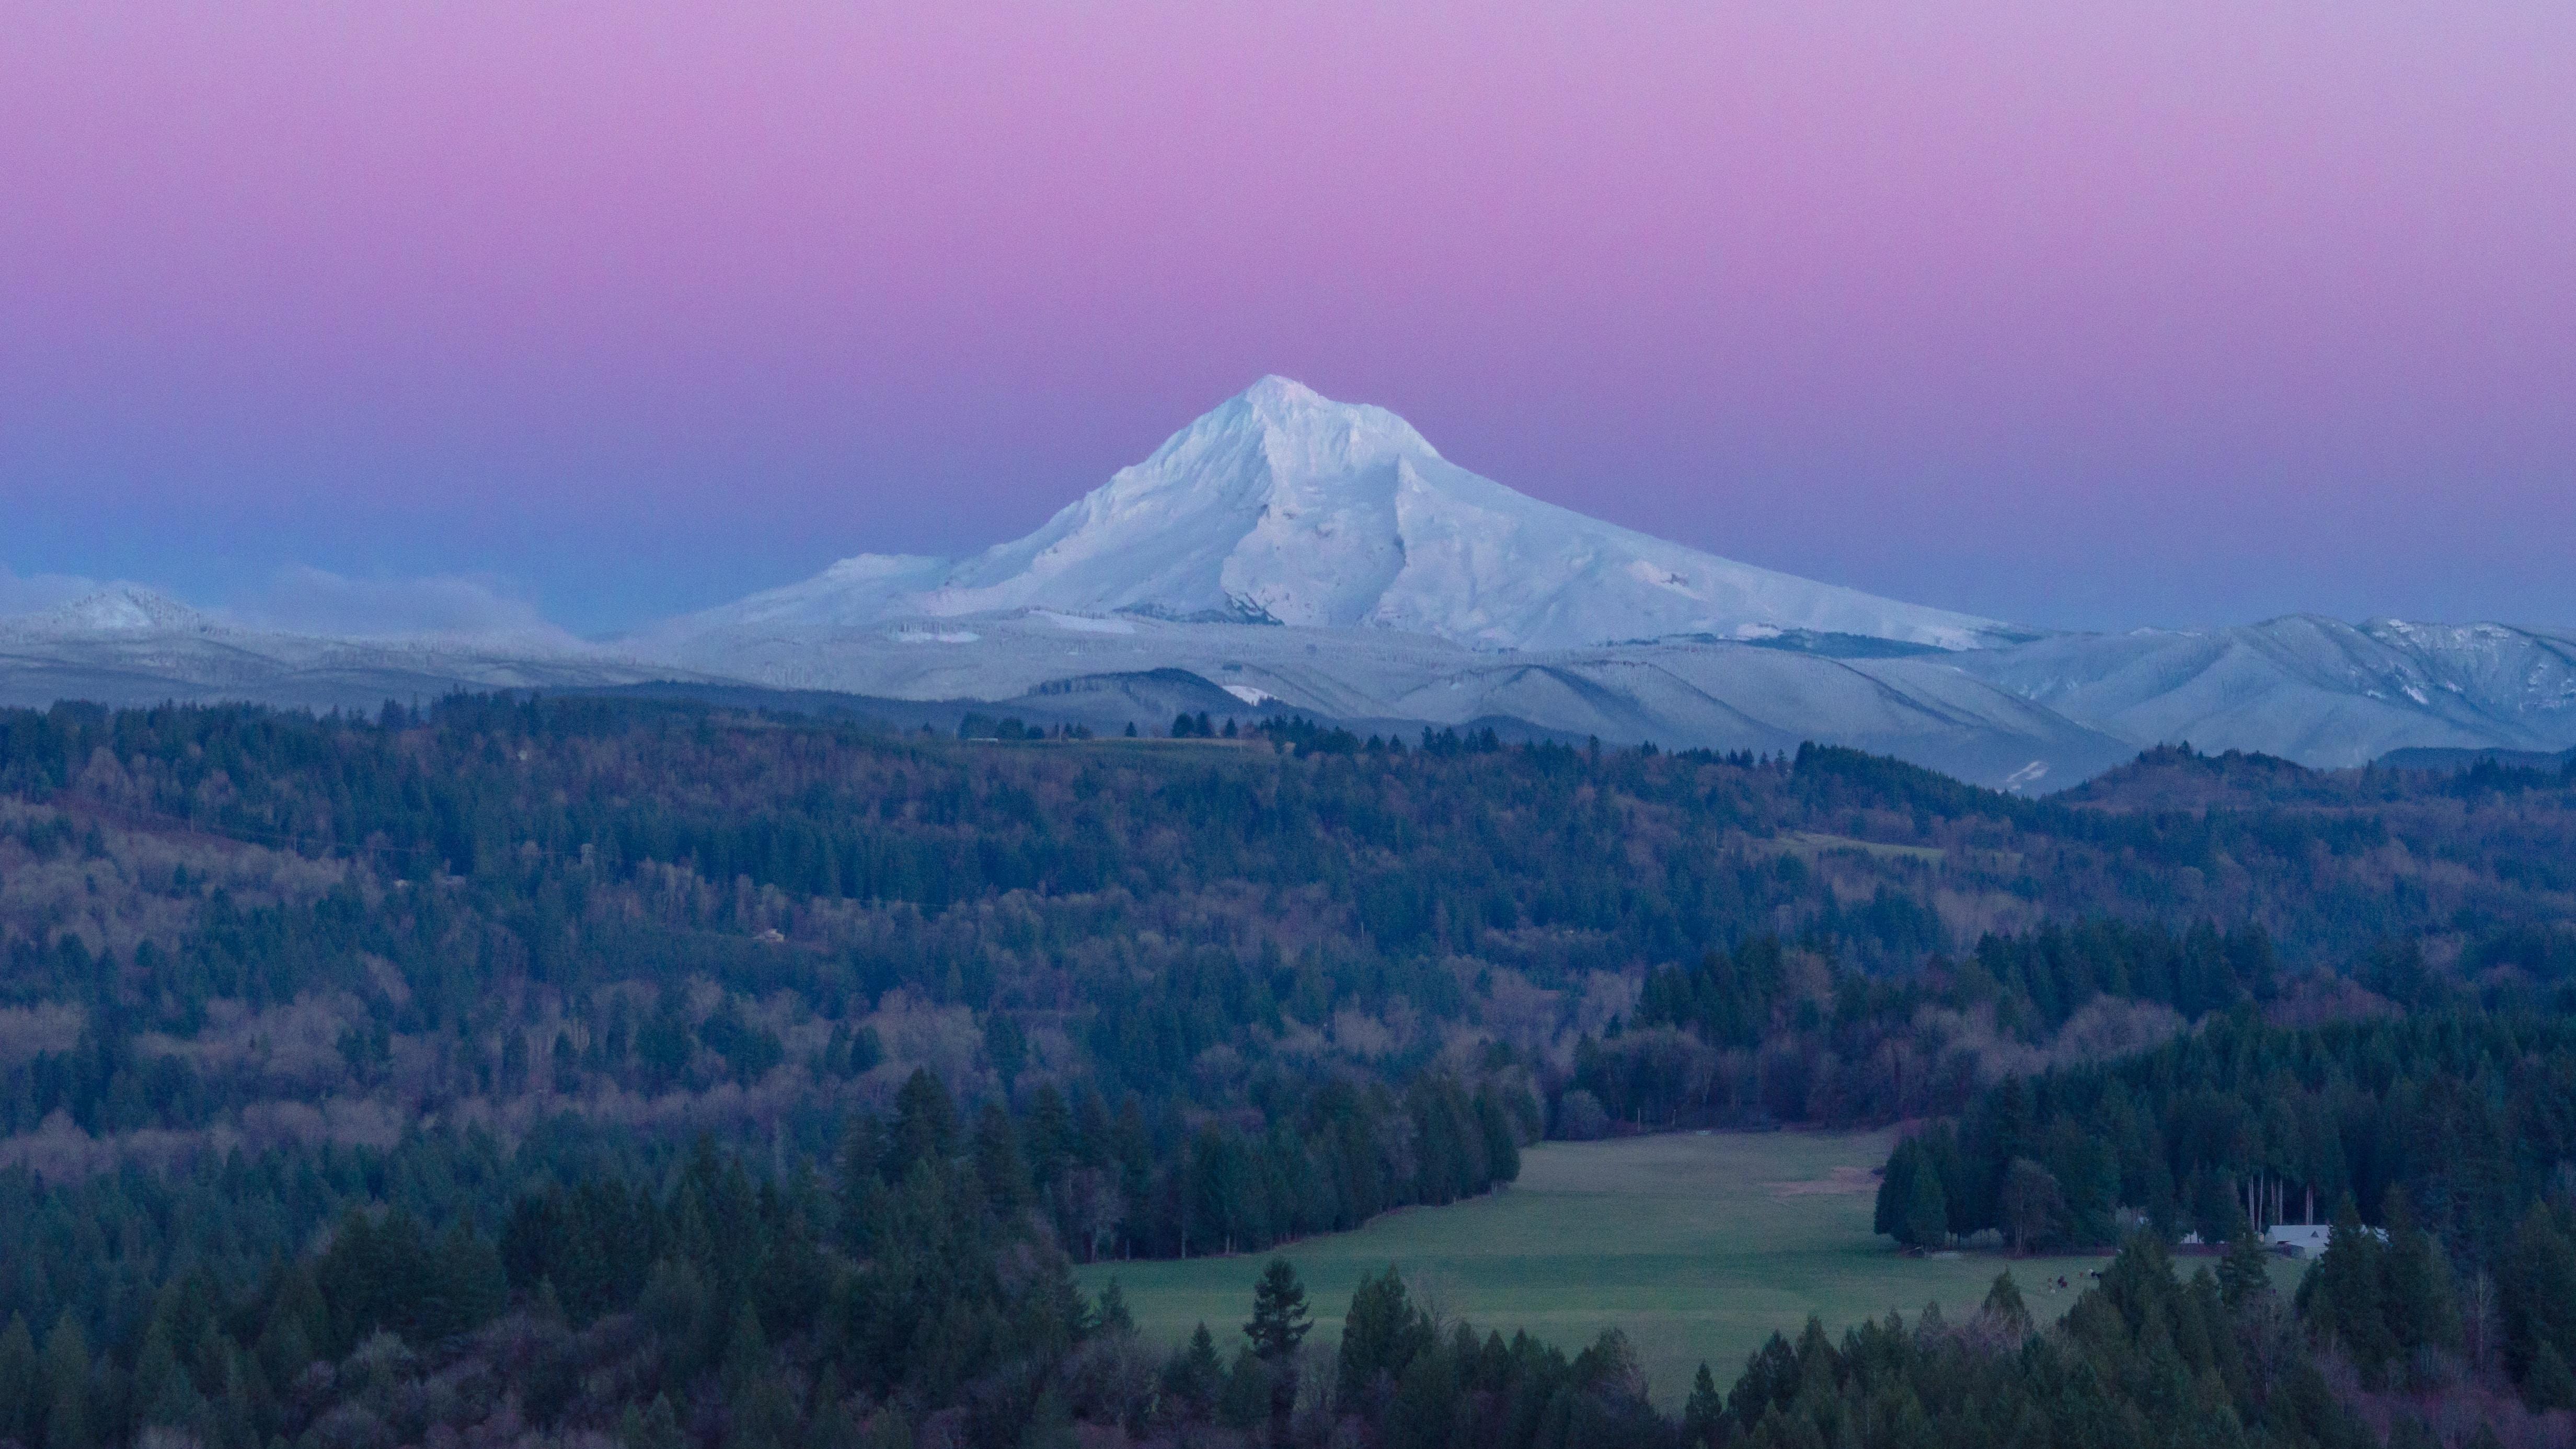 Woods around a snowy mountain under a purple sky